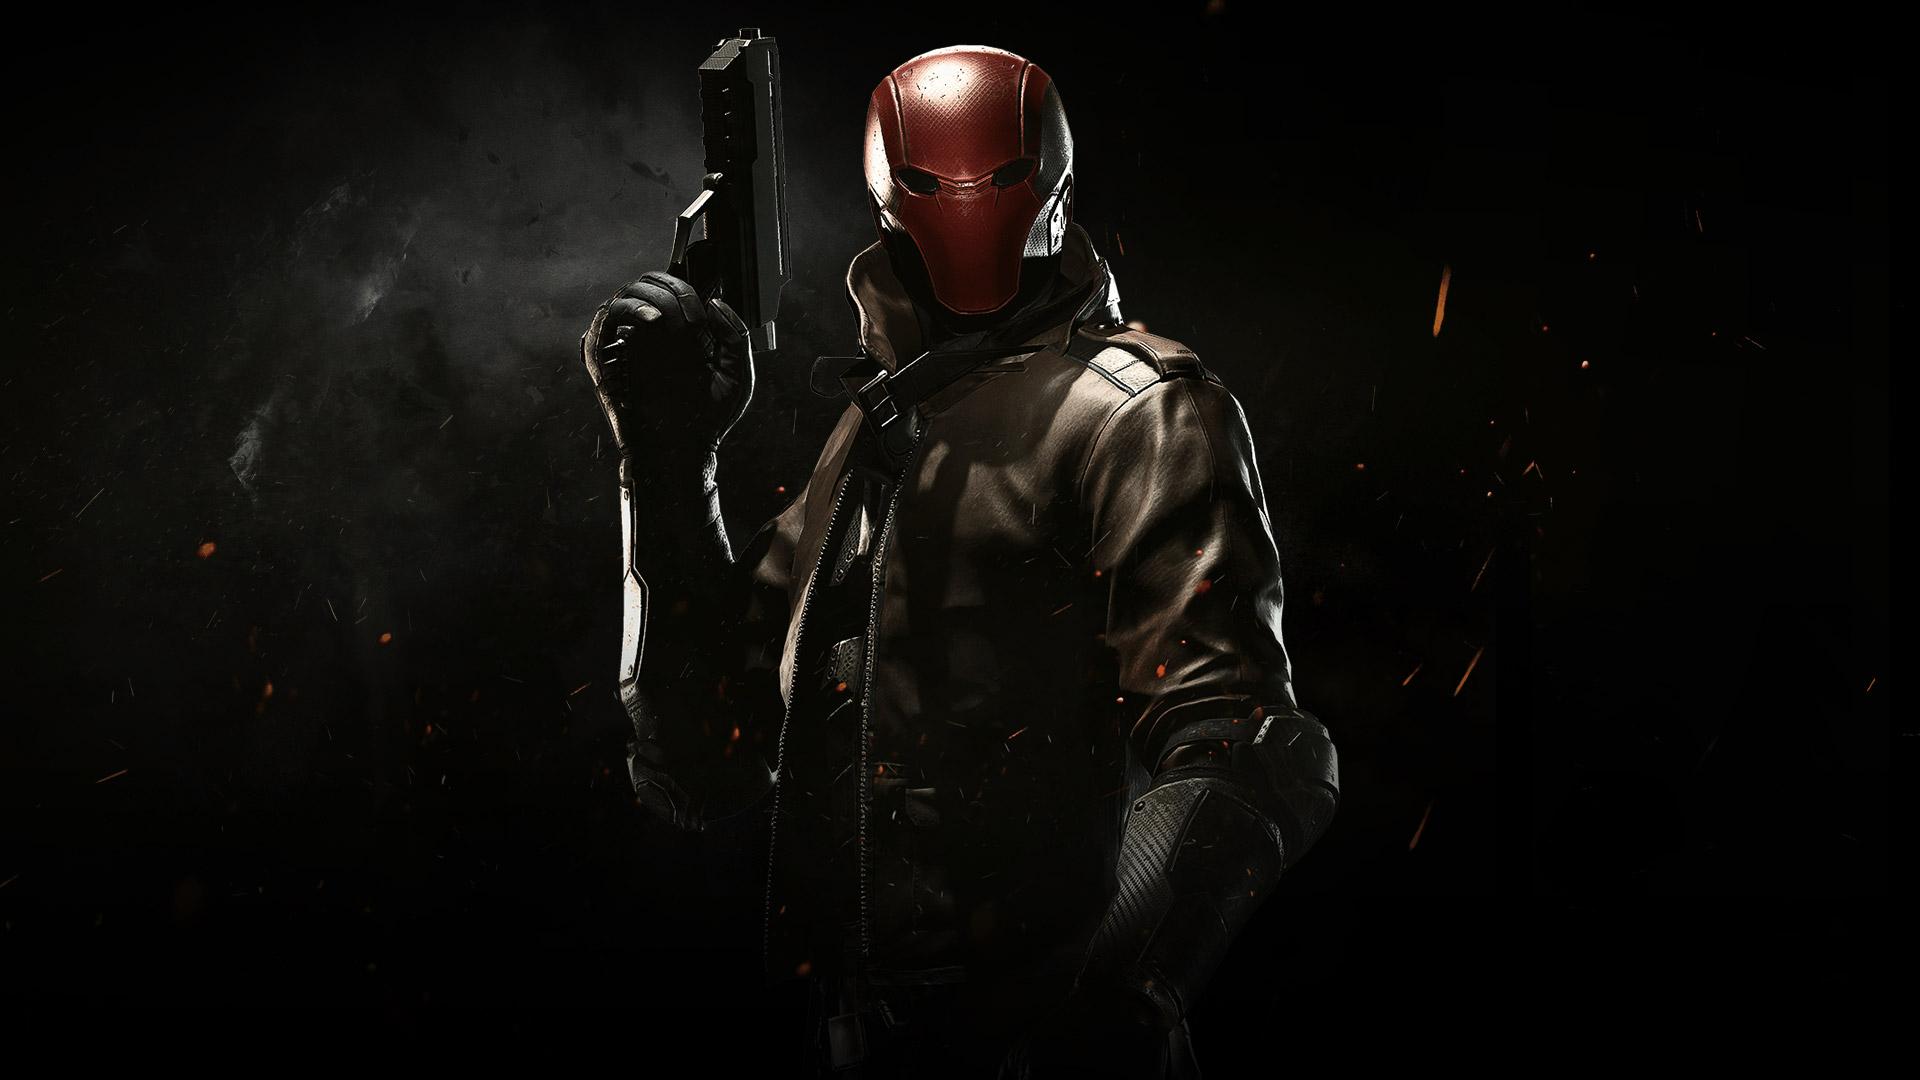 Red Hood Wallpaper Injustice 2 - HD Wallpaper